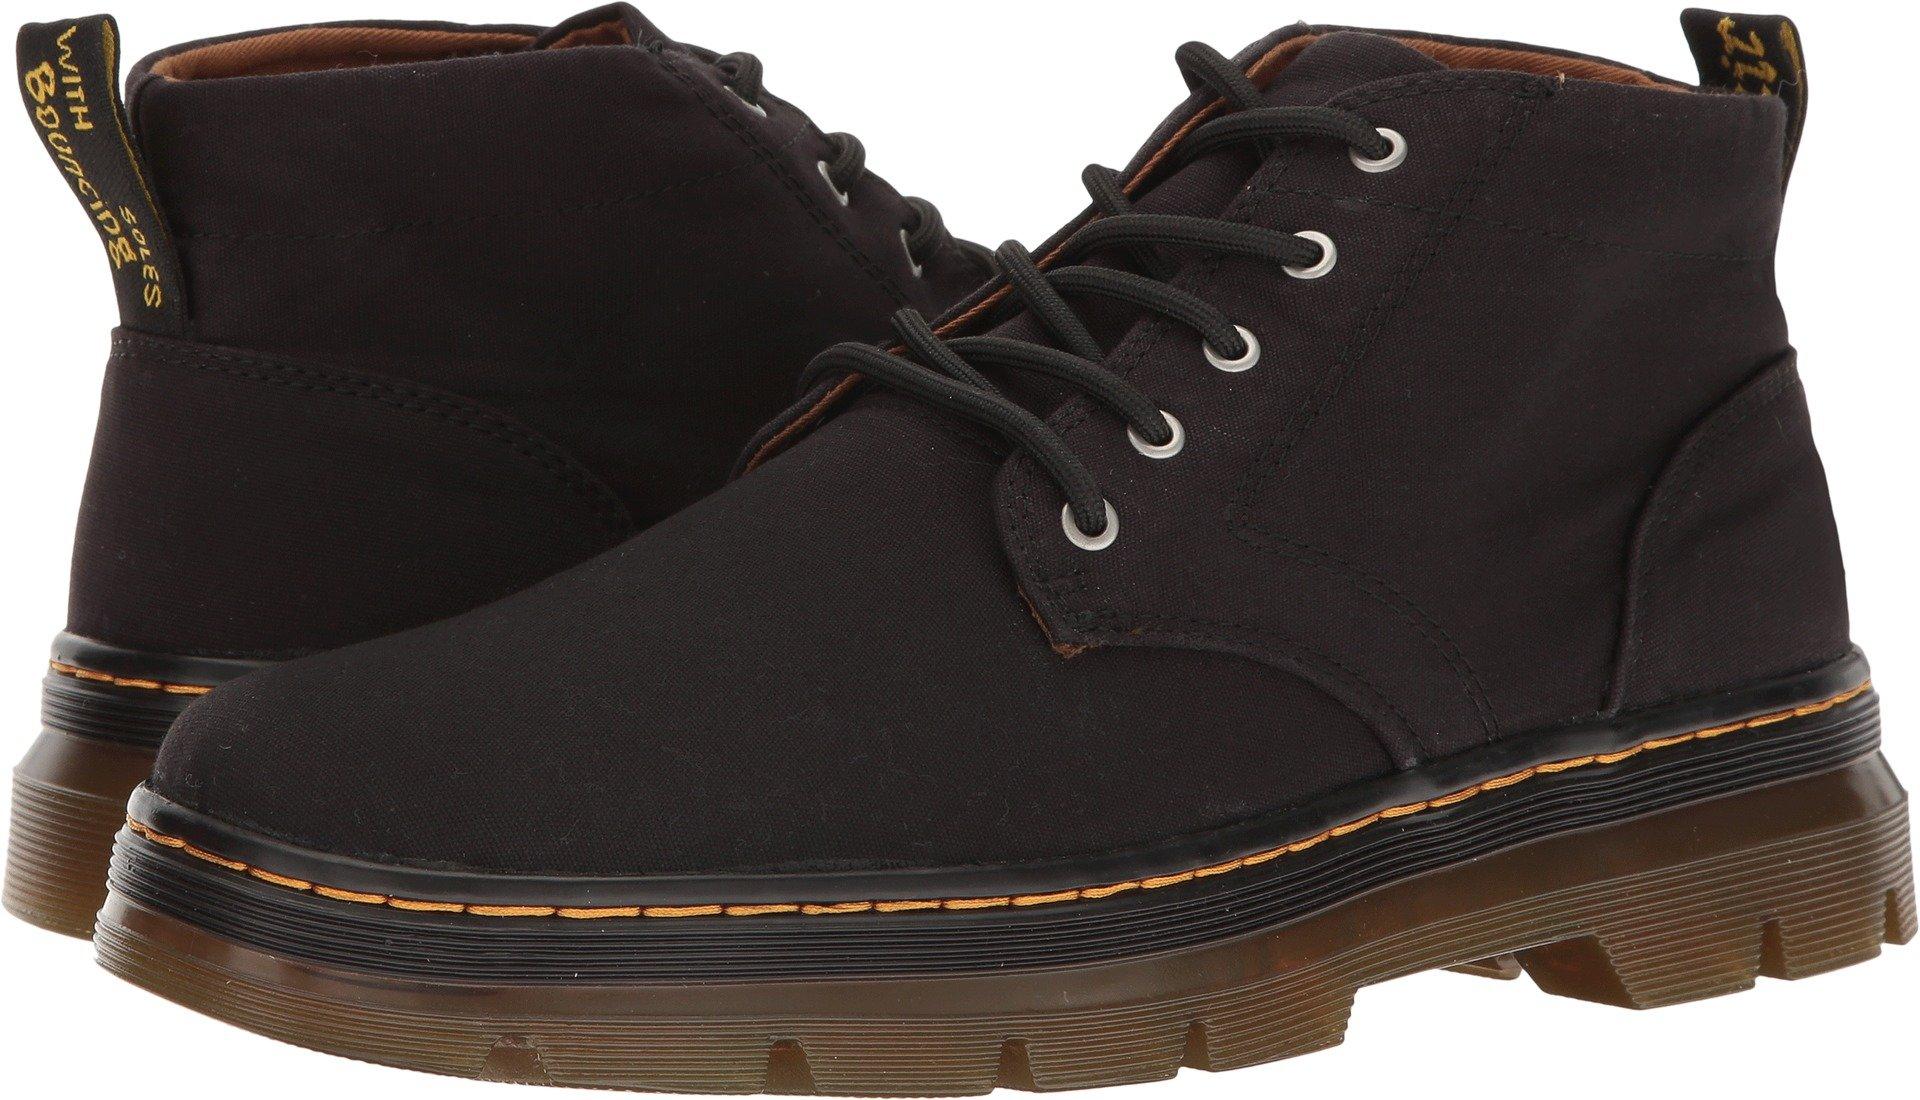 Dr. Martens Men's Bonny Chukka Boot, Black, 12 UK/13 M US